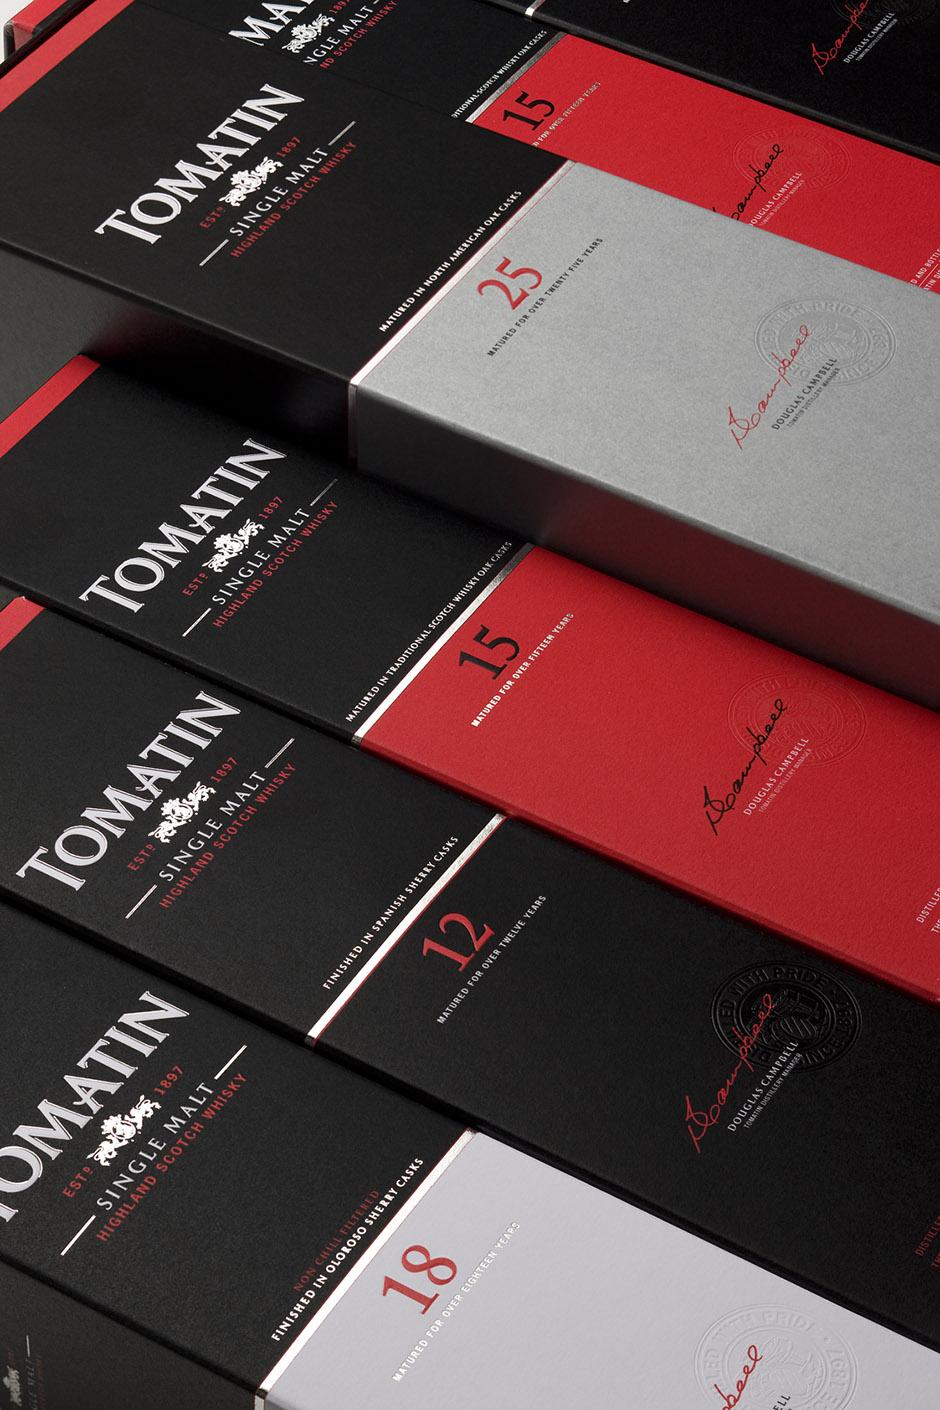 Breeze creative design consultants tomatin single malt for Creative design consultants